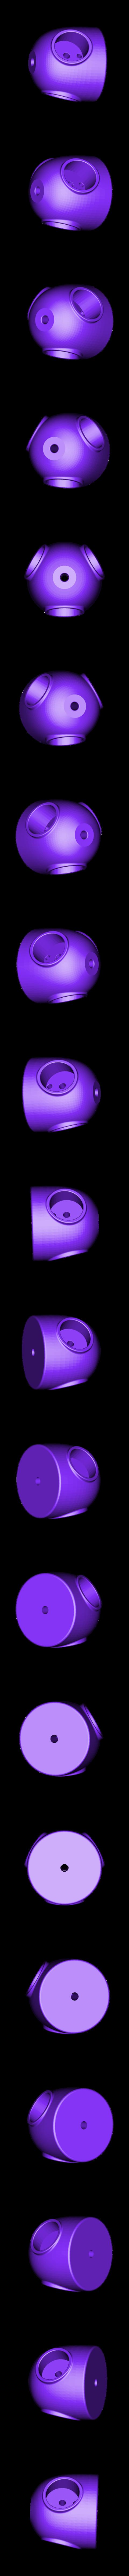 eolienne_2_cone.STL Download free STL file Eolienne Wind turbine • 3D printing model, lulu3Dbuilder